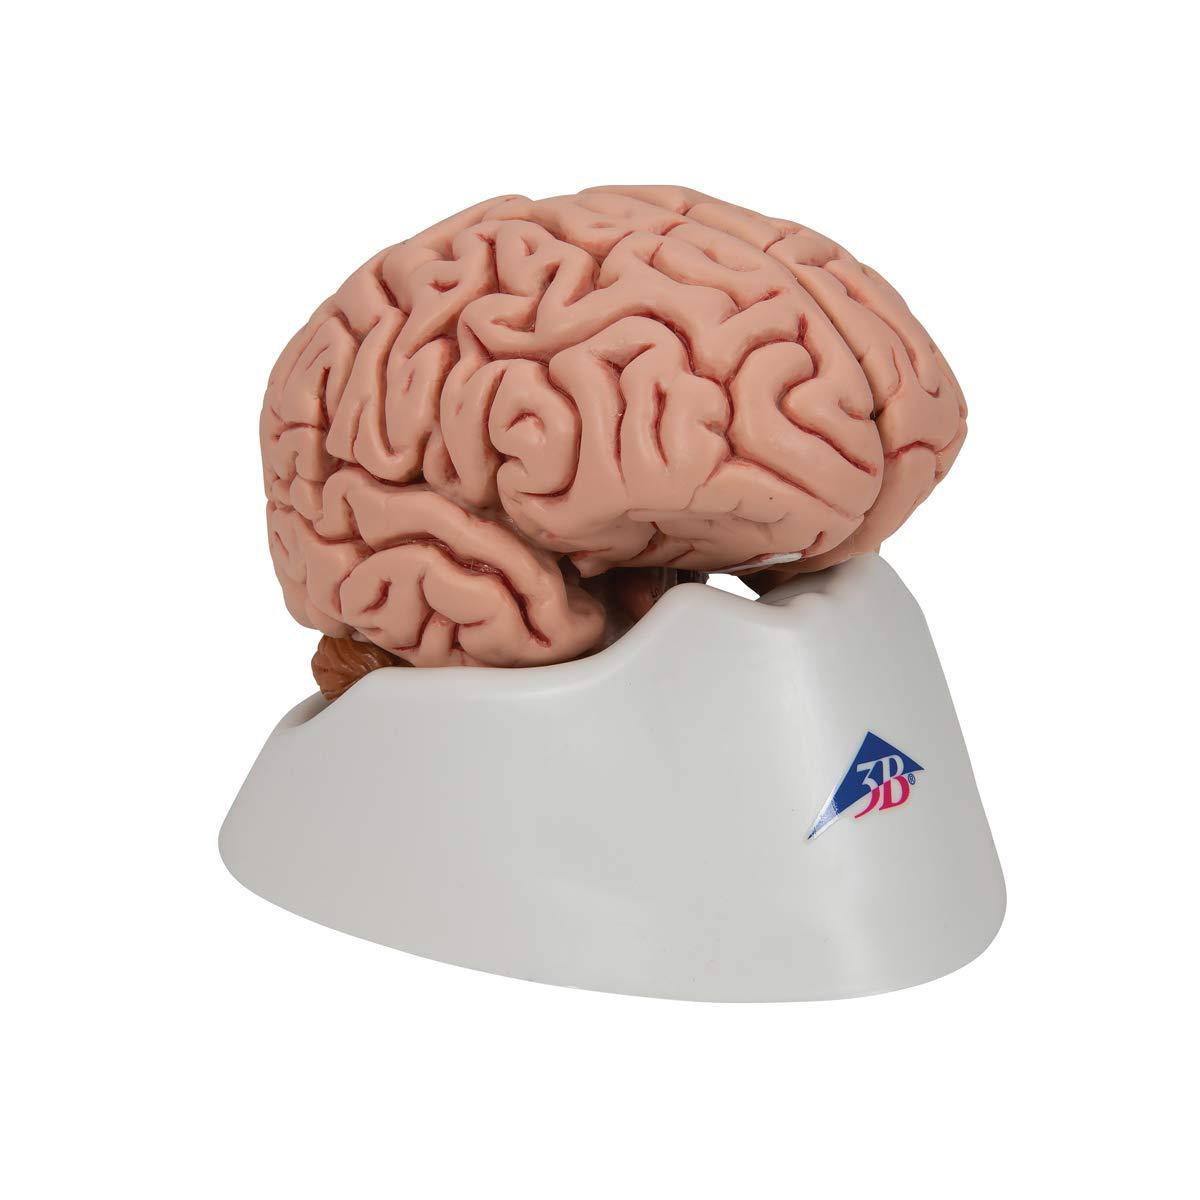 3B 5-part brain model